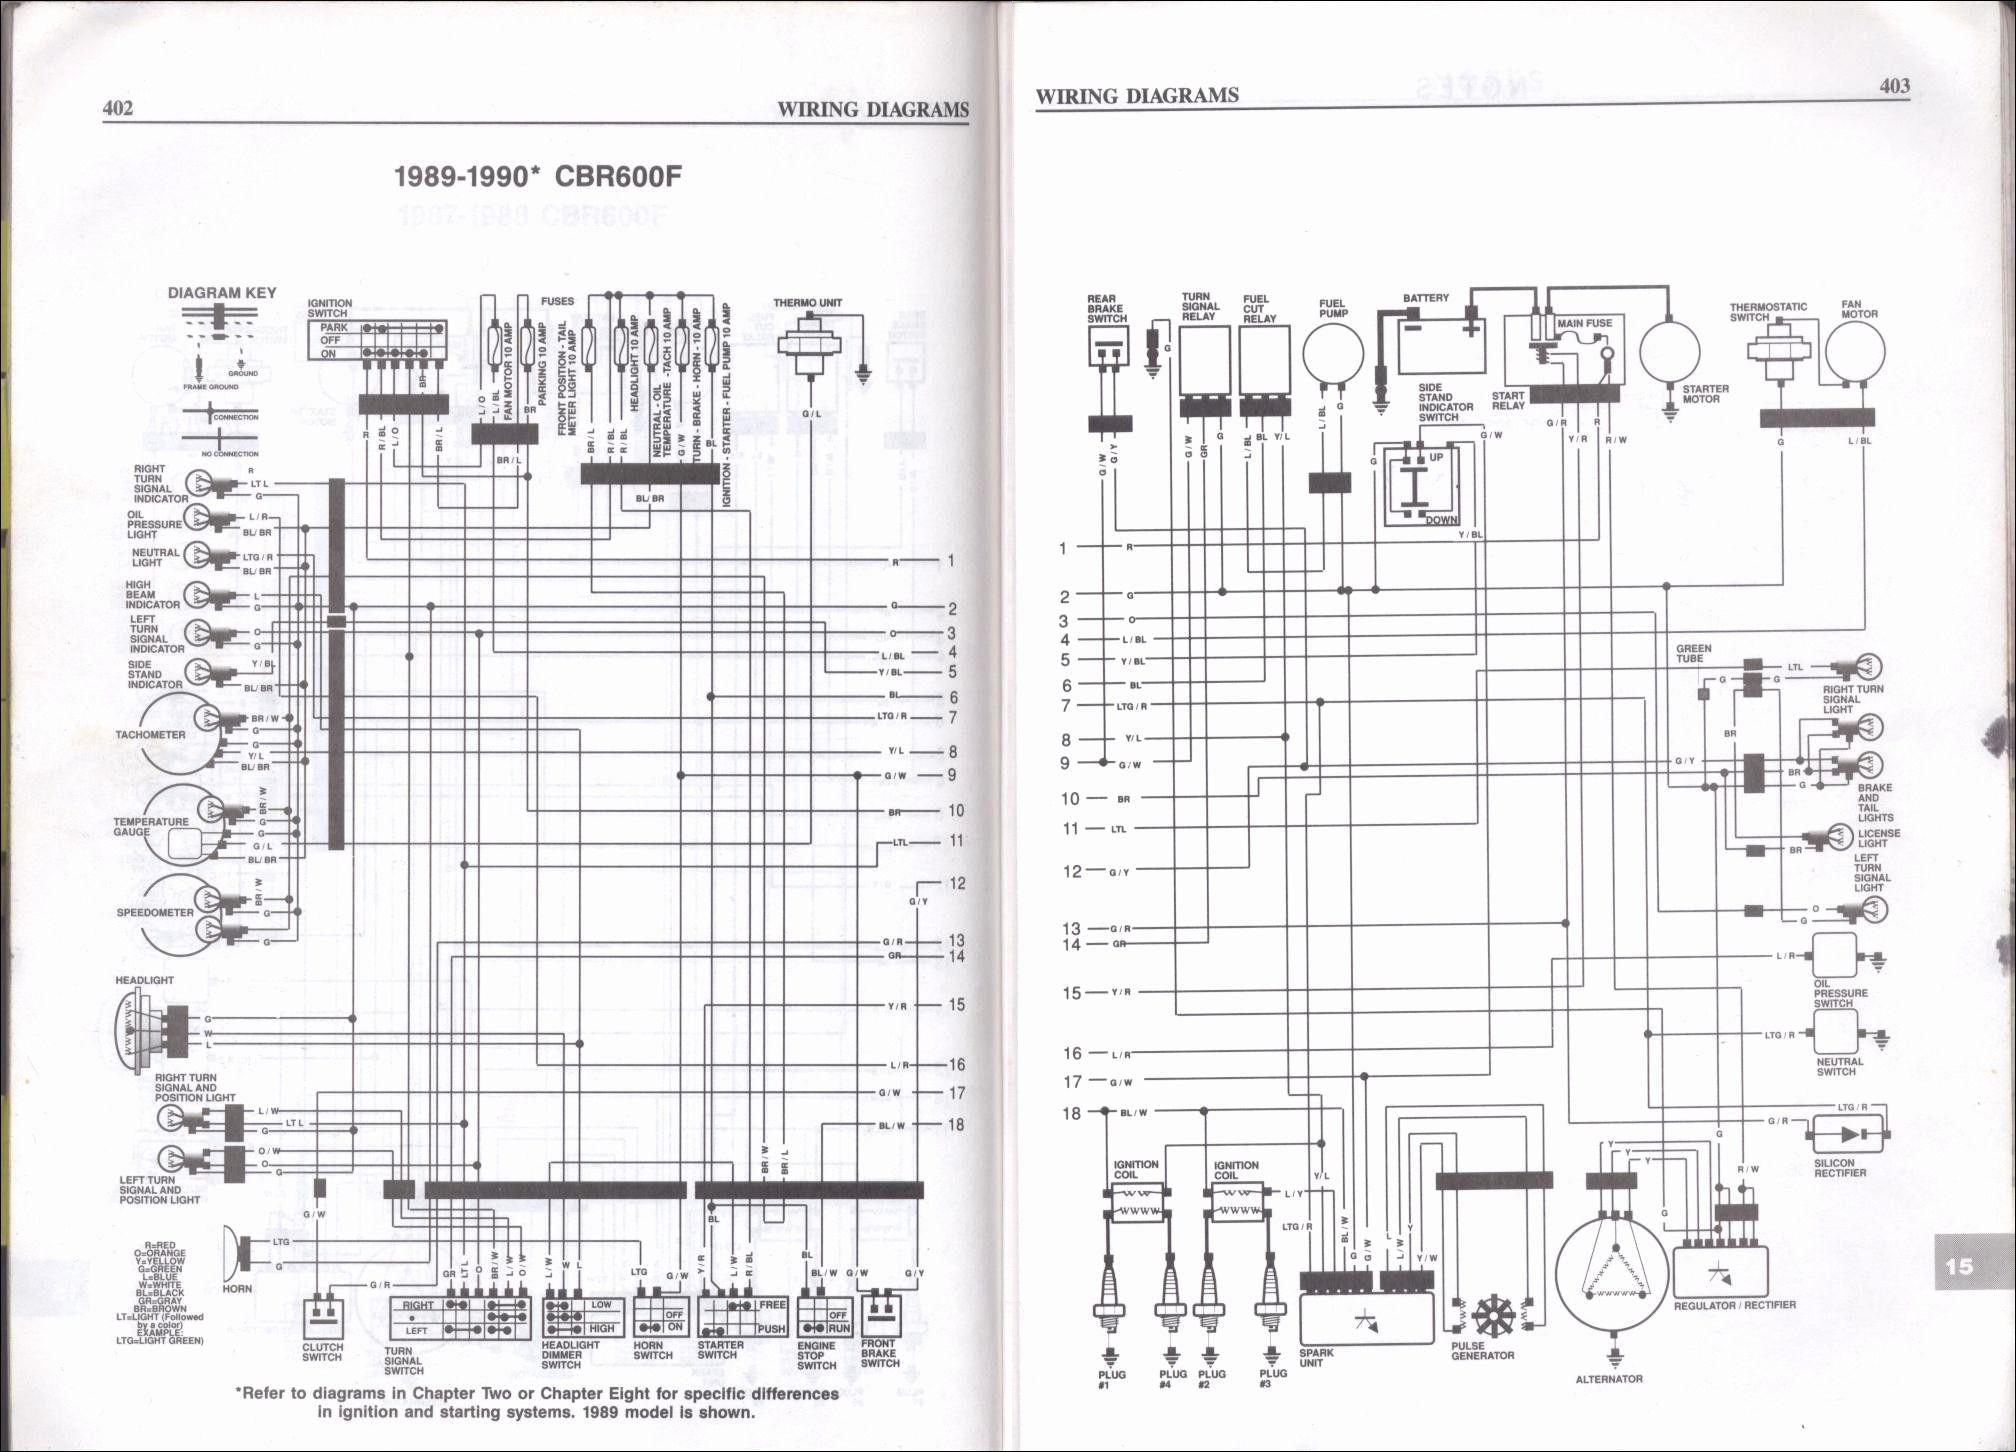 John Deere Electrical Bo Wiring Systems Honda C70 Wiring Diagram Auto Electrical Wiring Diagram Of John Deere Electrical Bo Wiring Systems